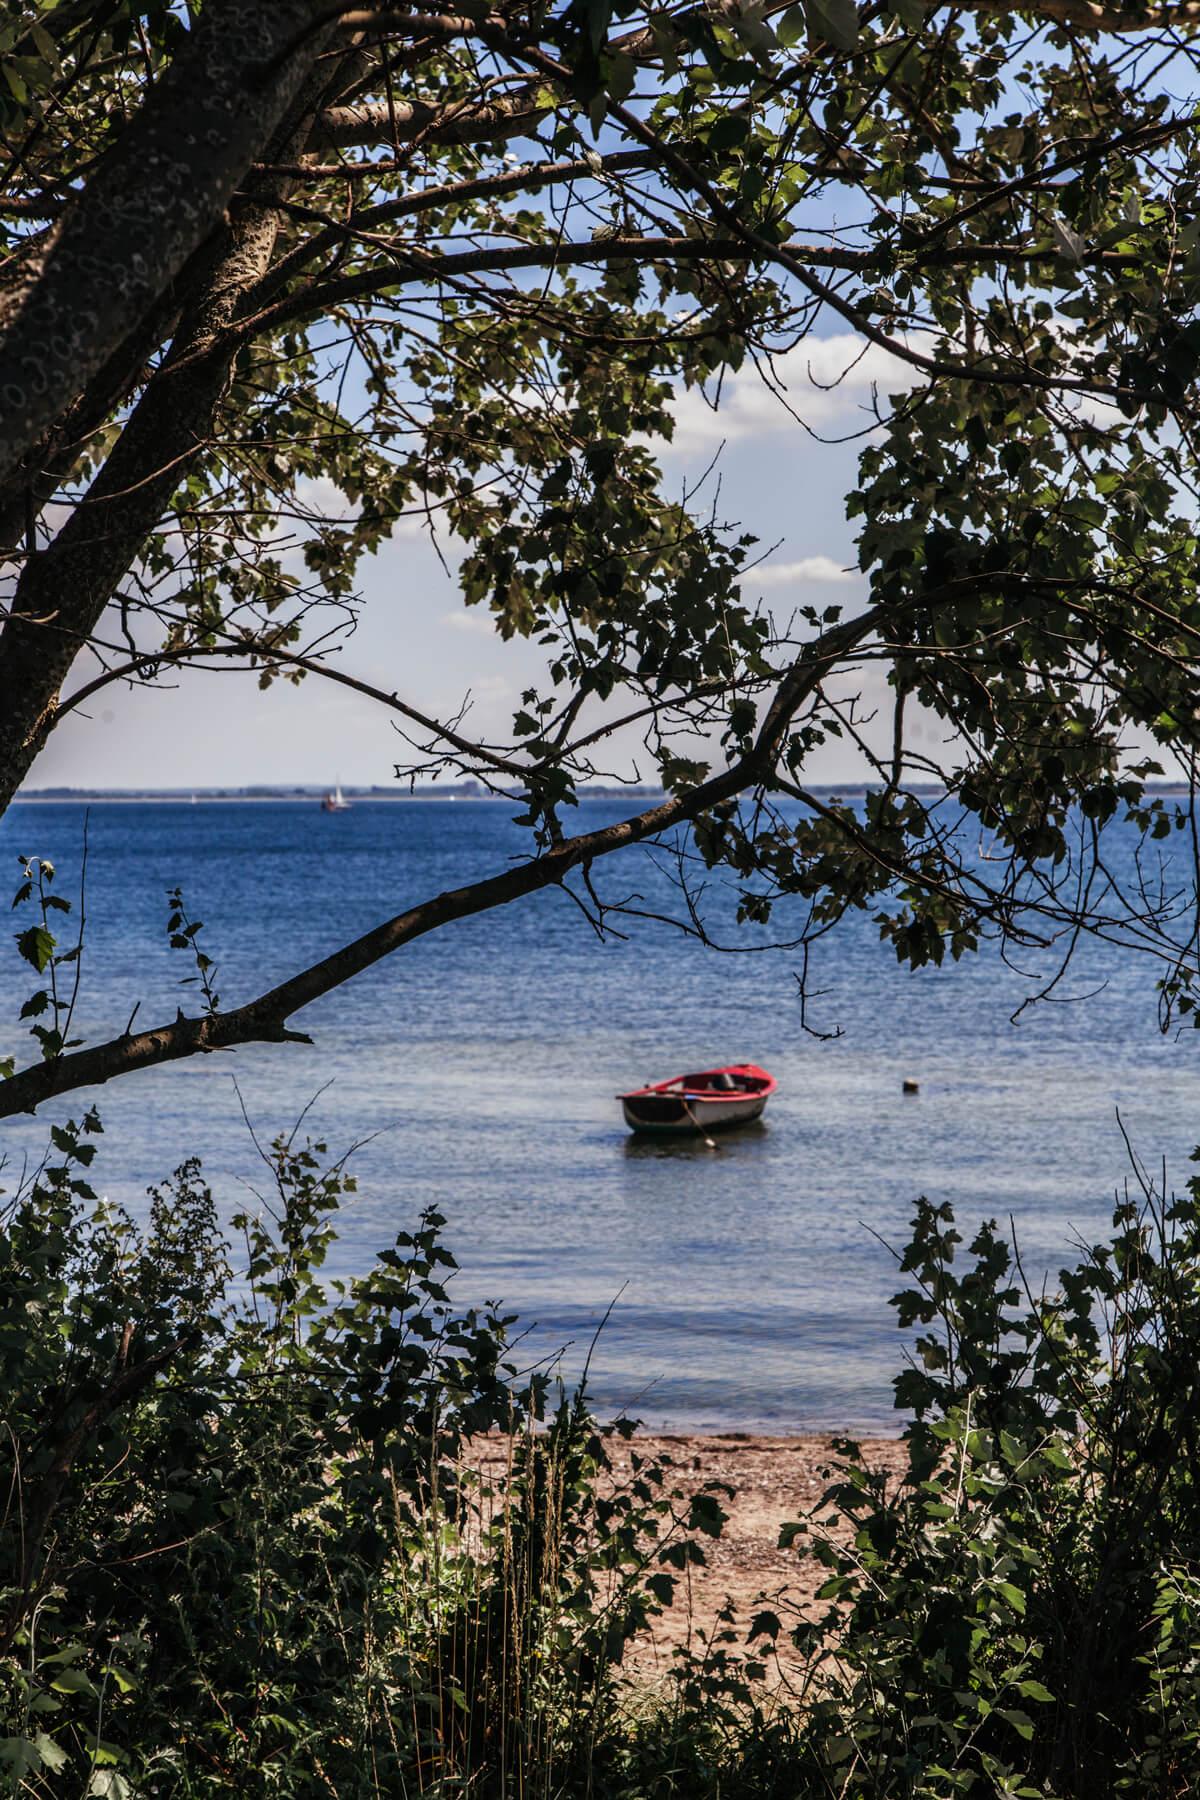 Ostseeurlaub in Bülk